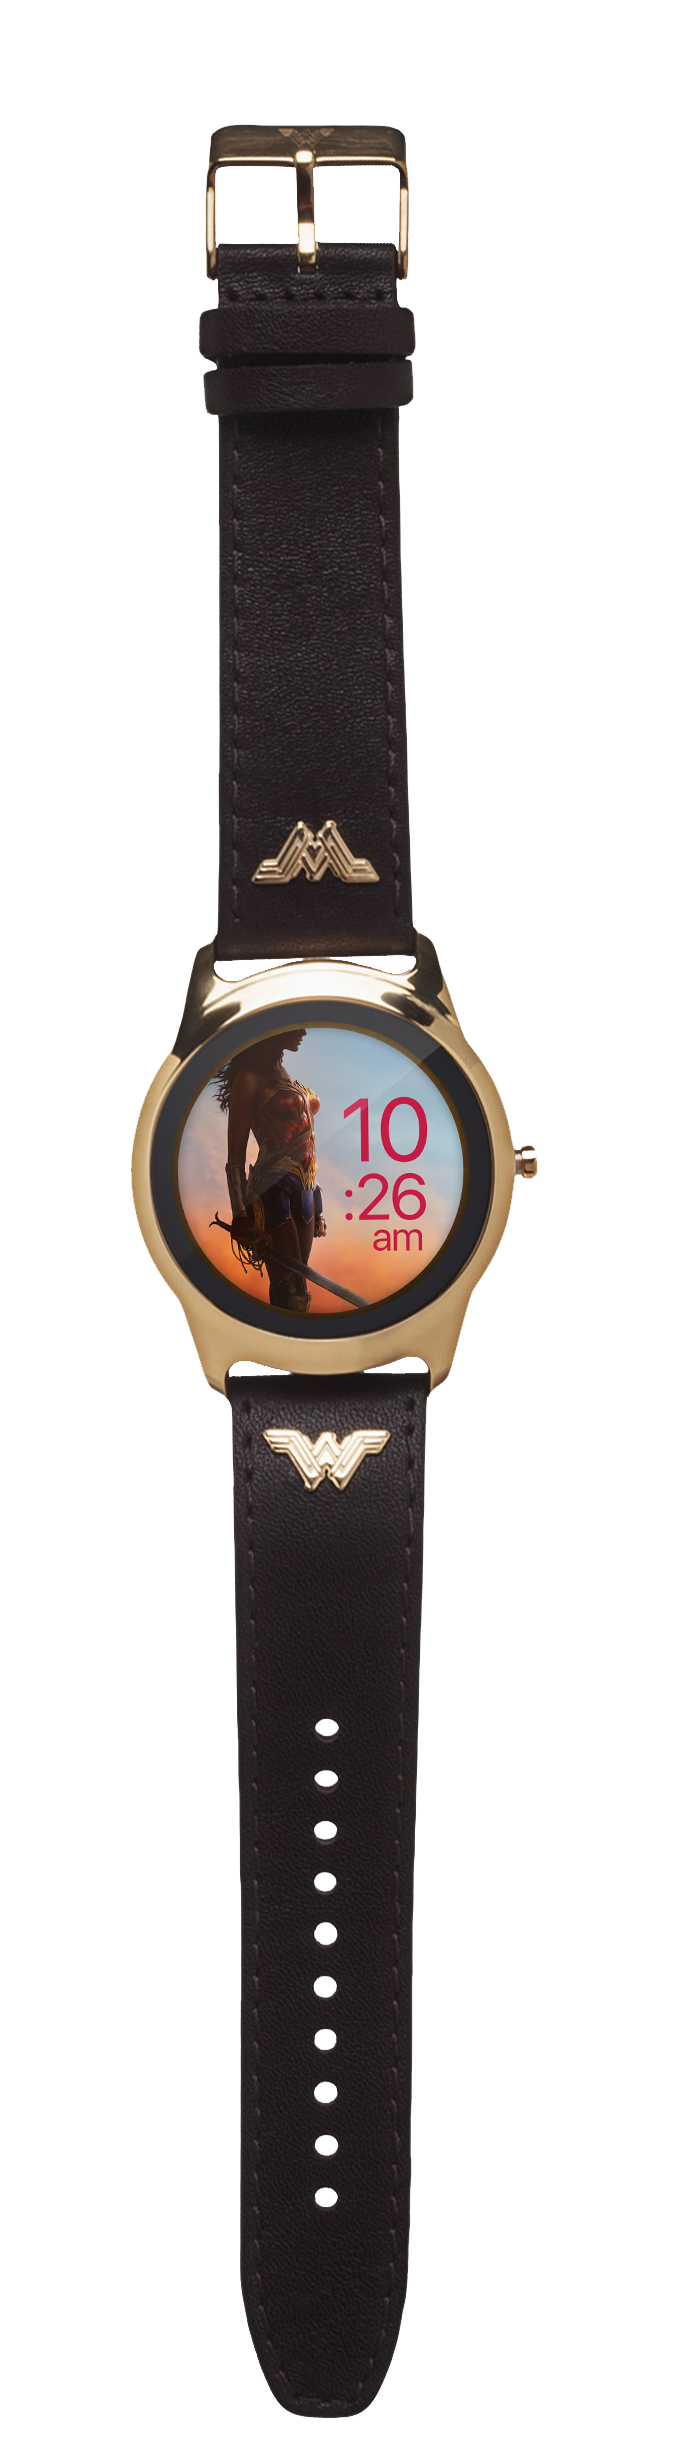 ONe61 - Smartwatch - Wonder Woman